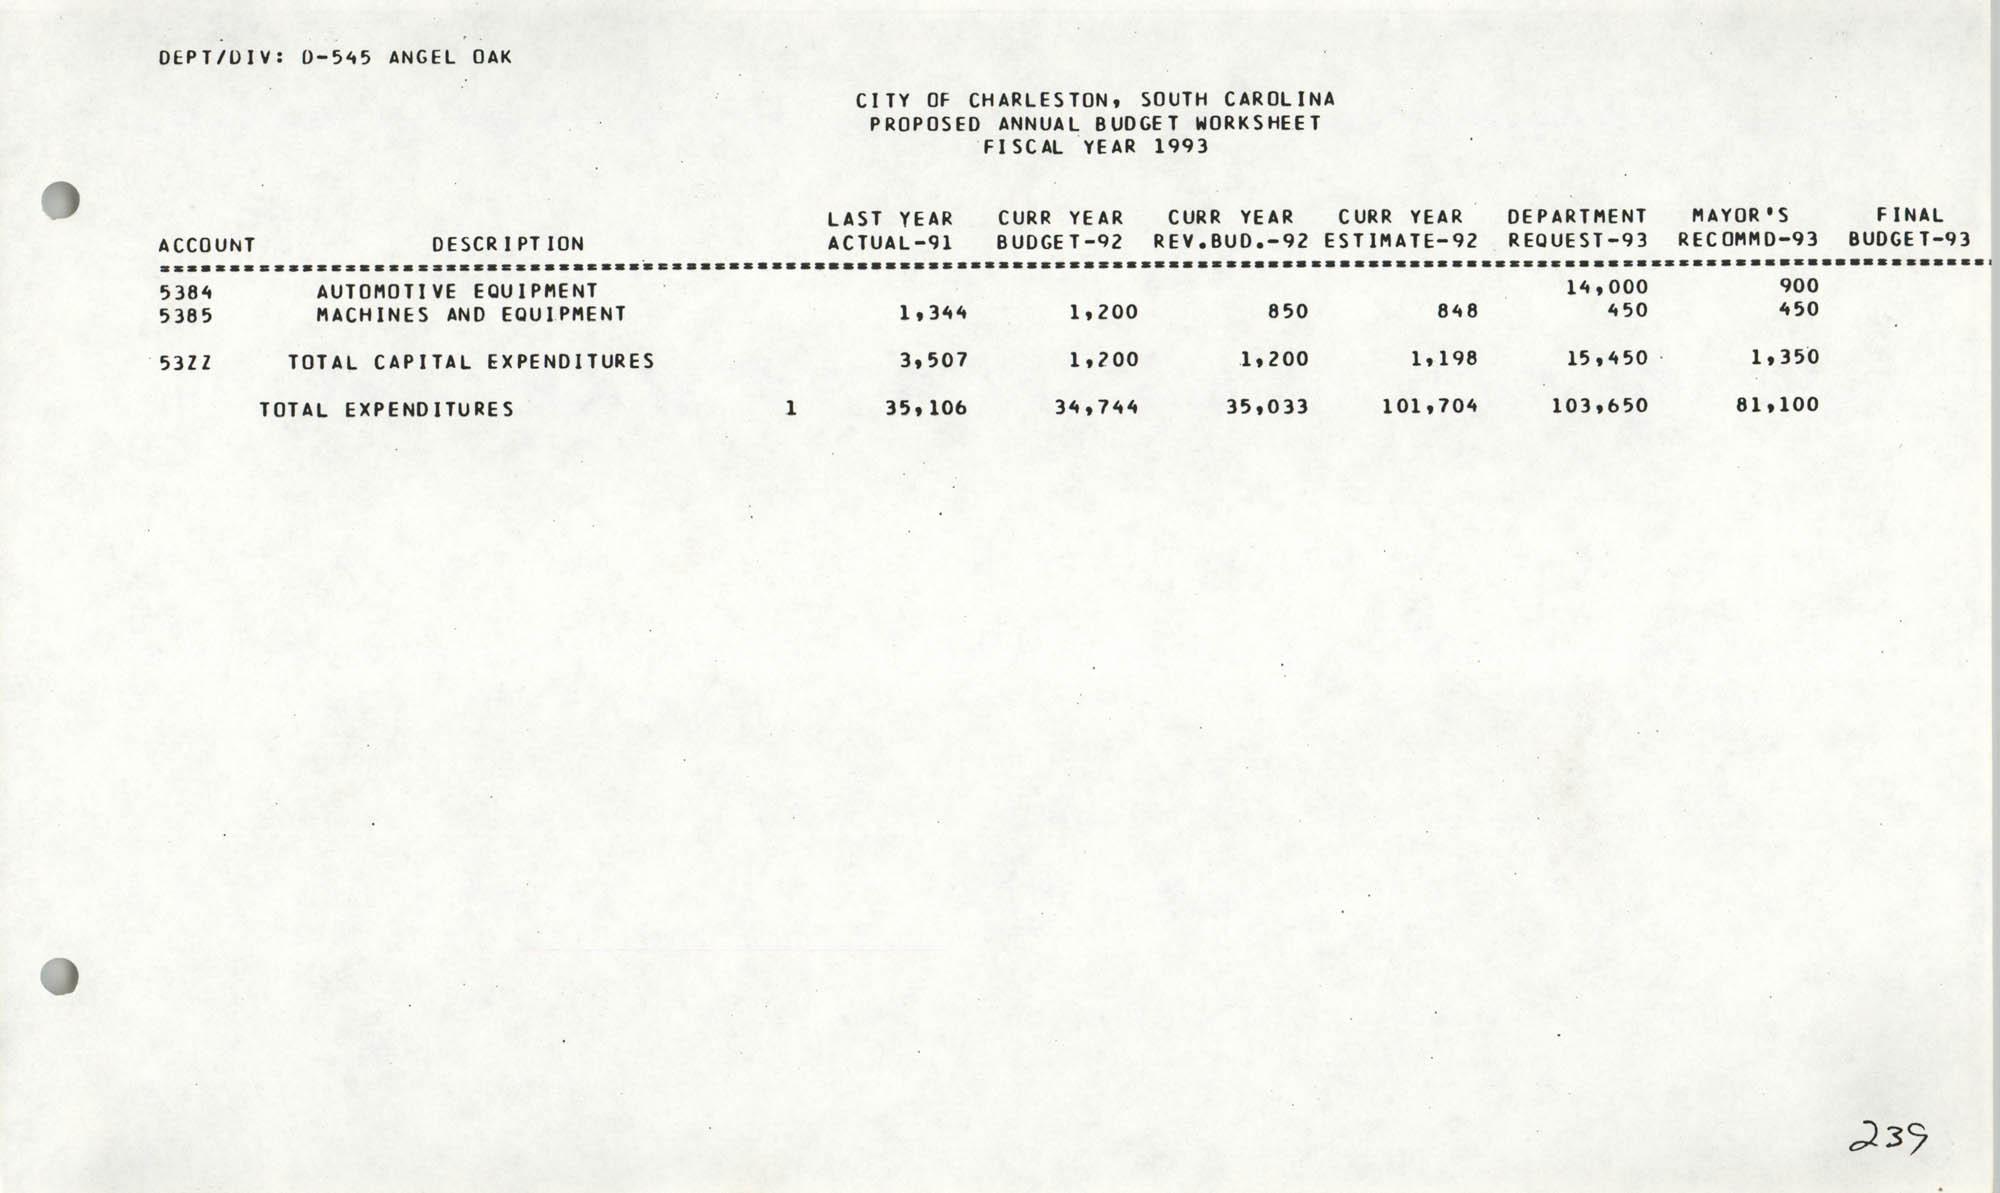 The City Council of Charleston, South Carolina, 1993 Budget, Page 239